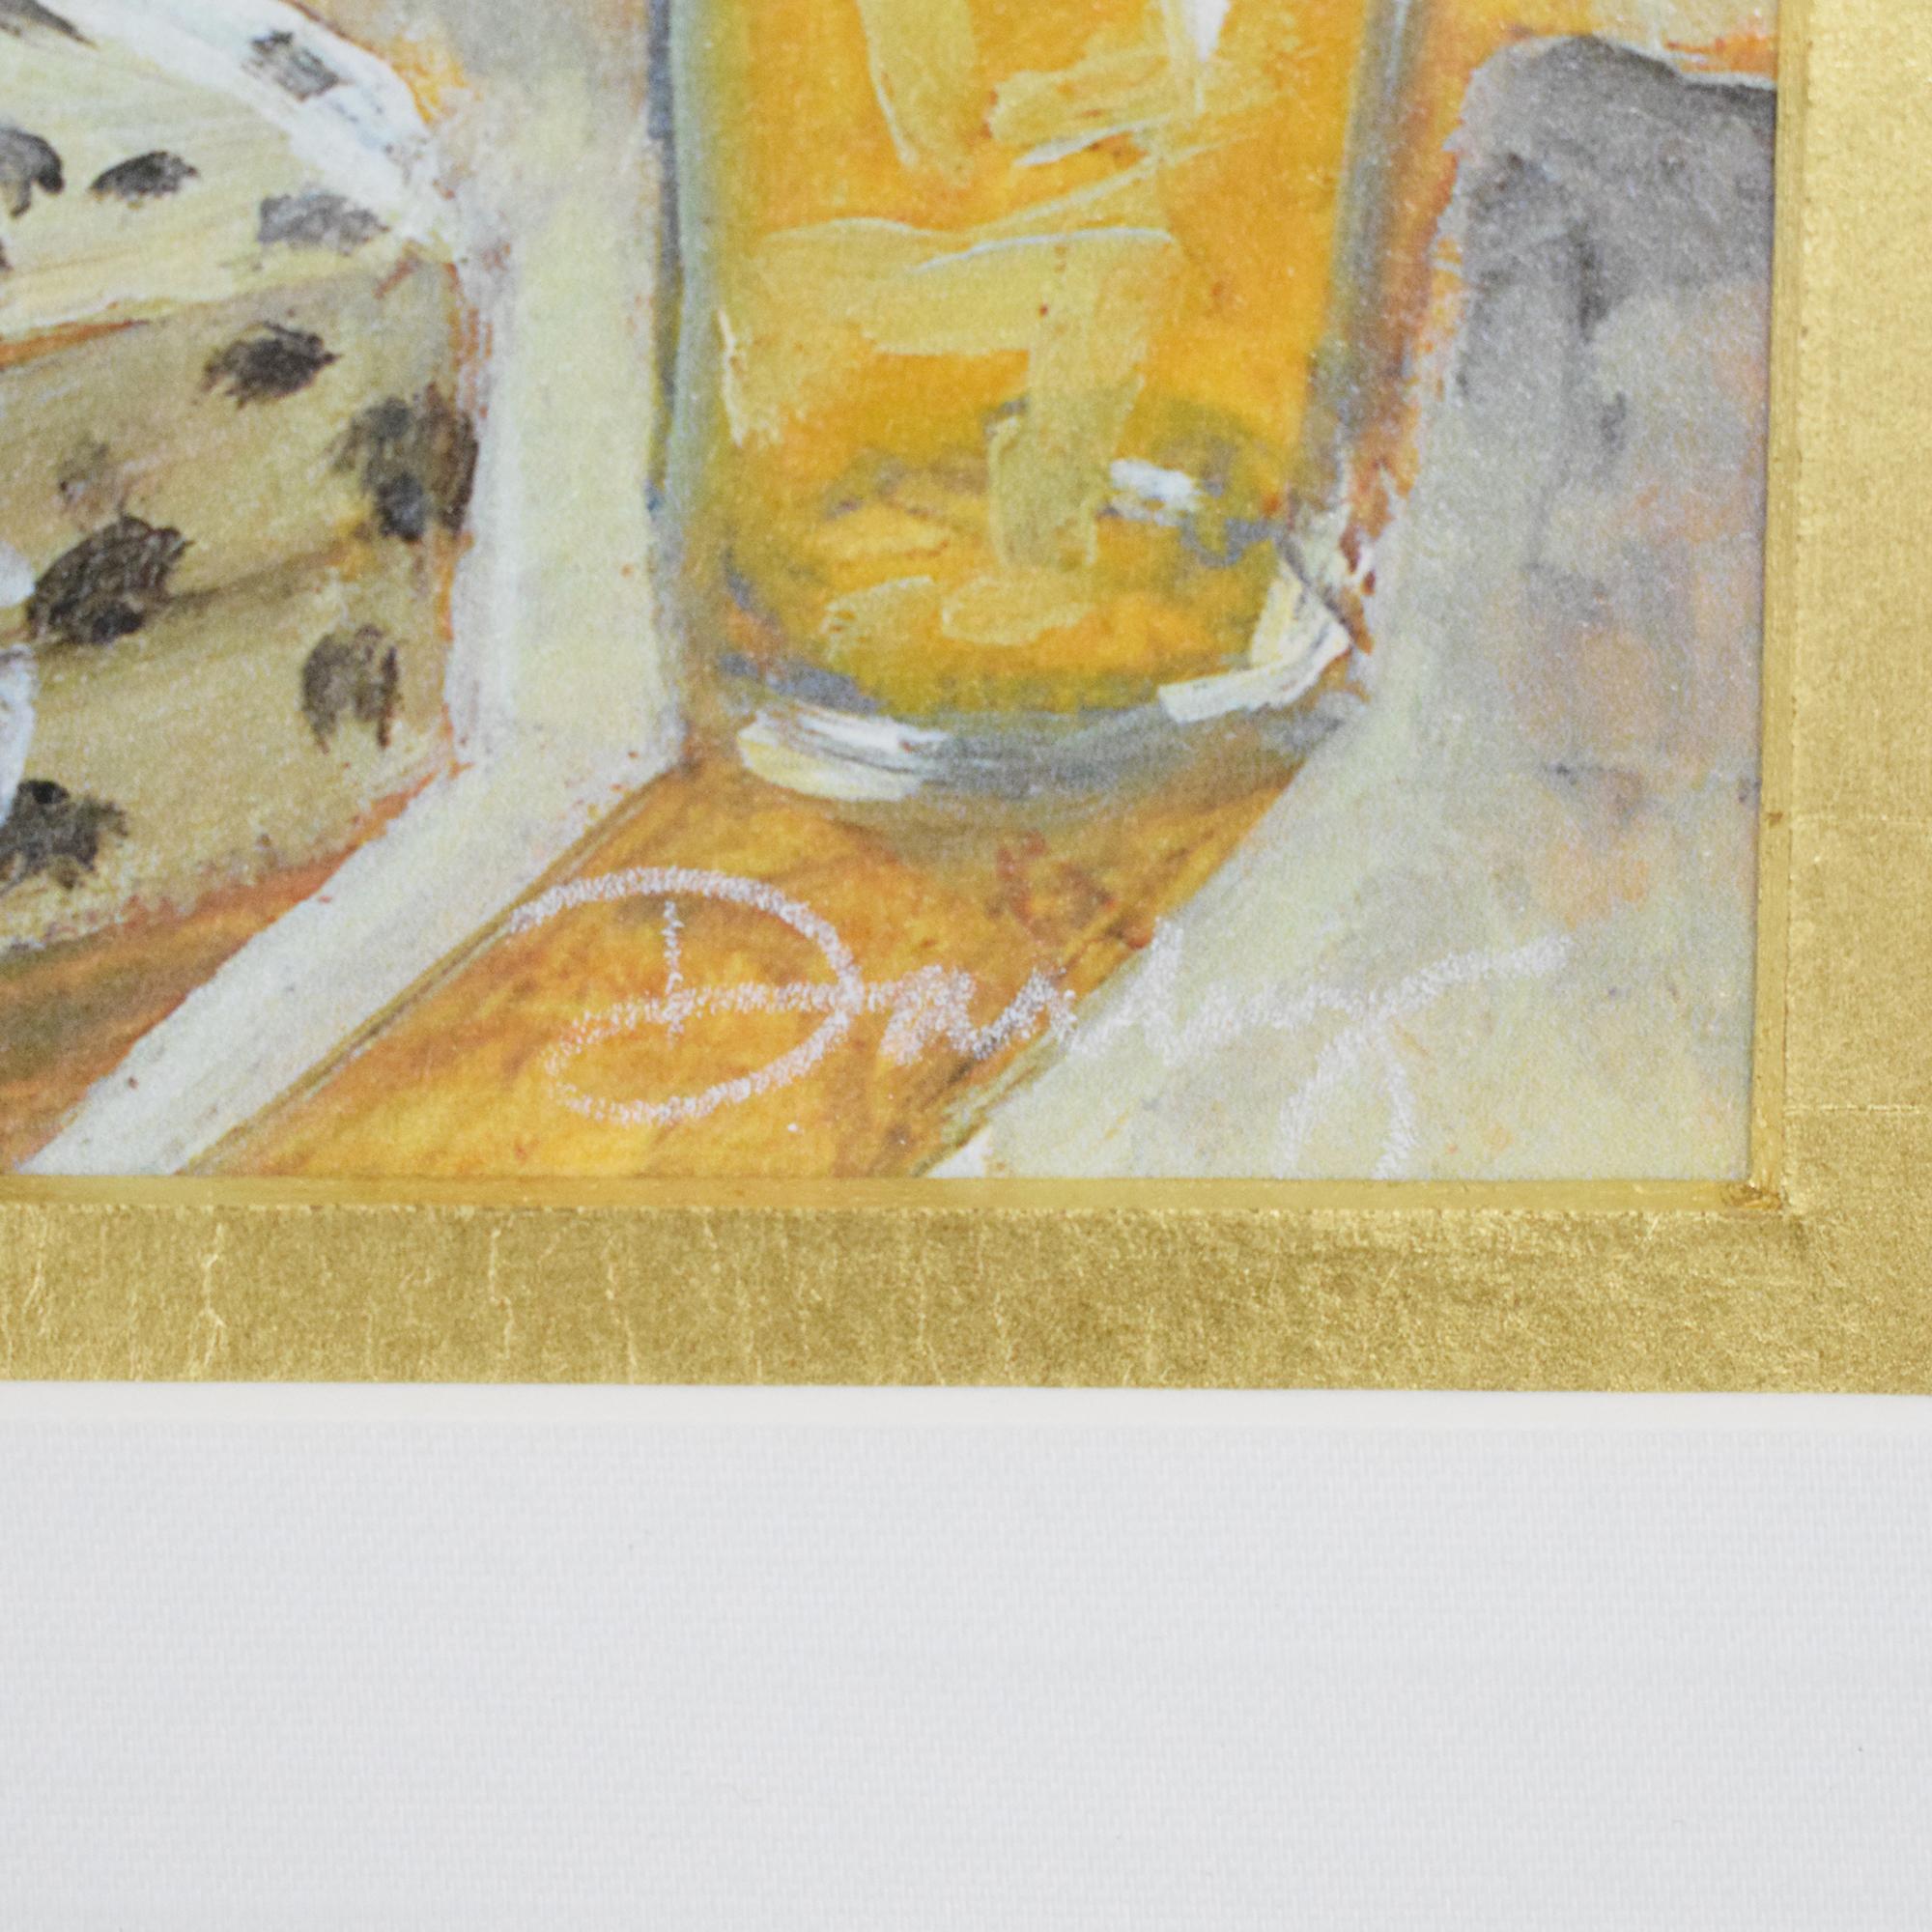 Ethan Allen Ethan Allen Flowers Wall Art ma